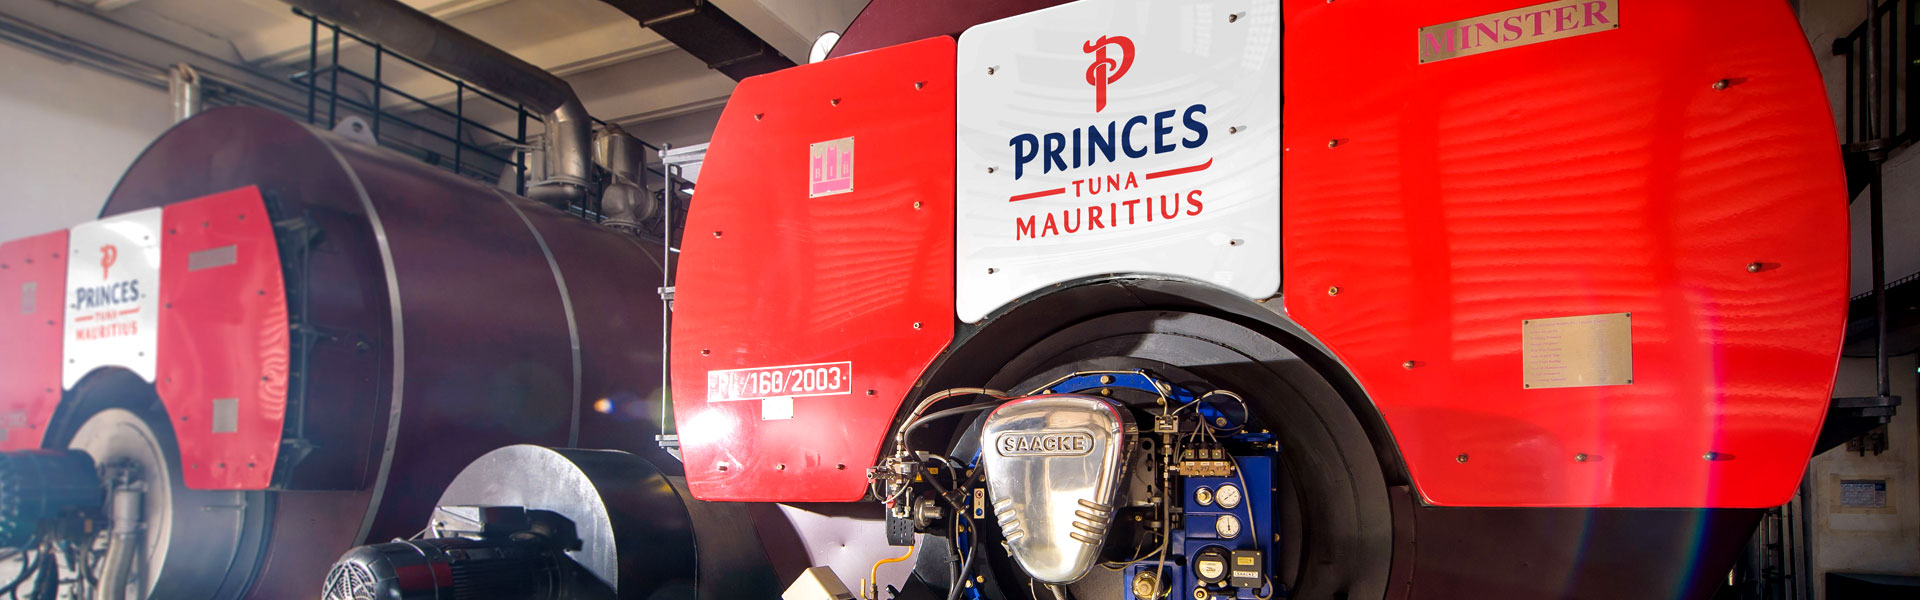 Buying tuna from Mauritius